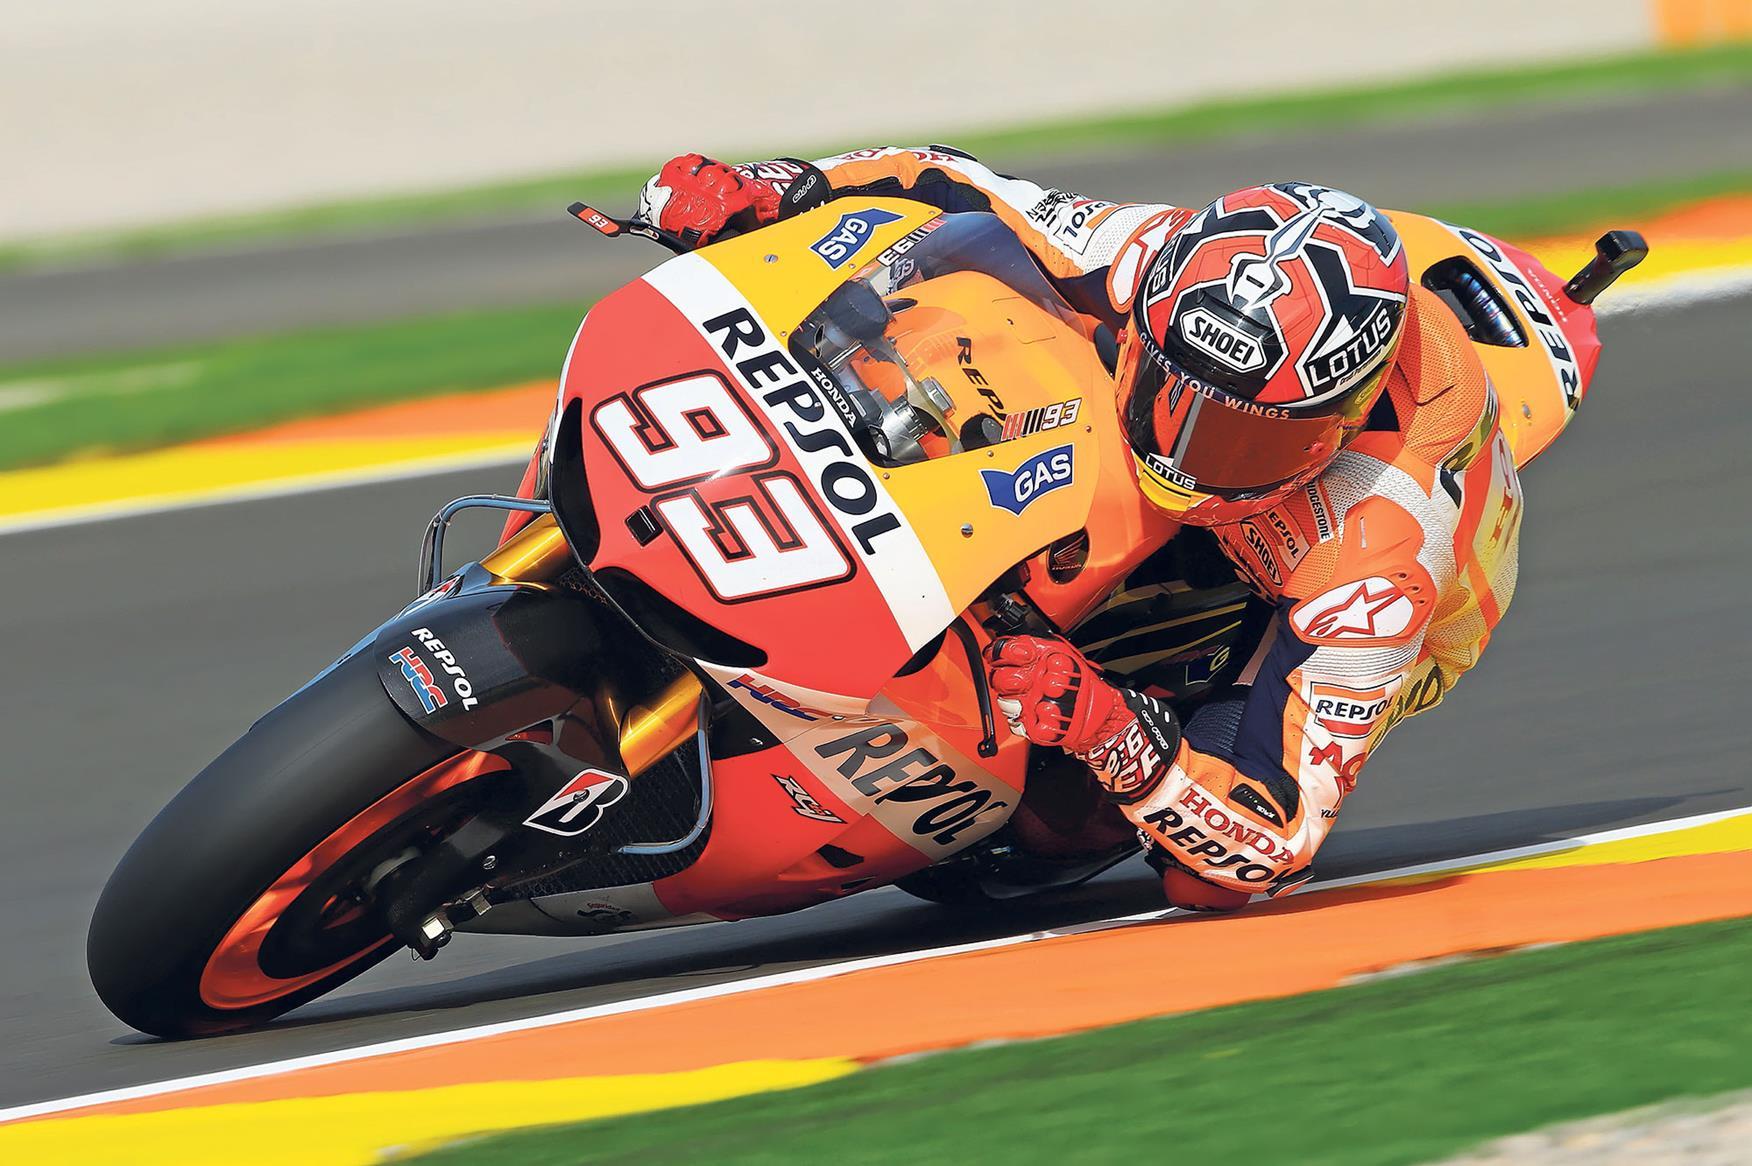 Marc Marquez wins MotoGP title at his first attempt